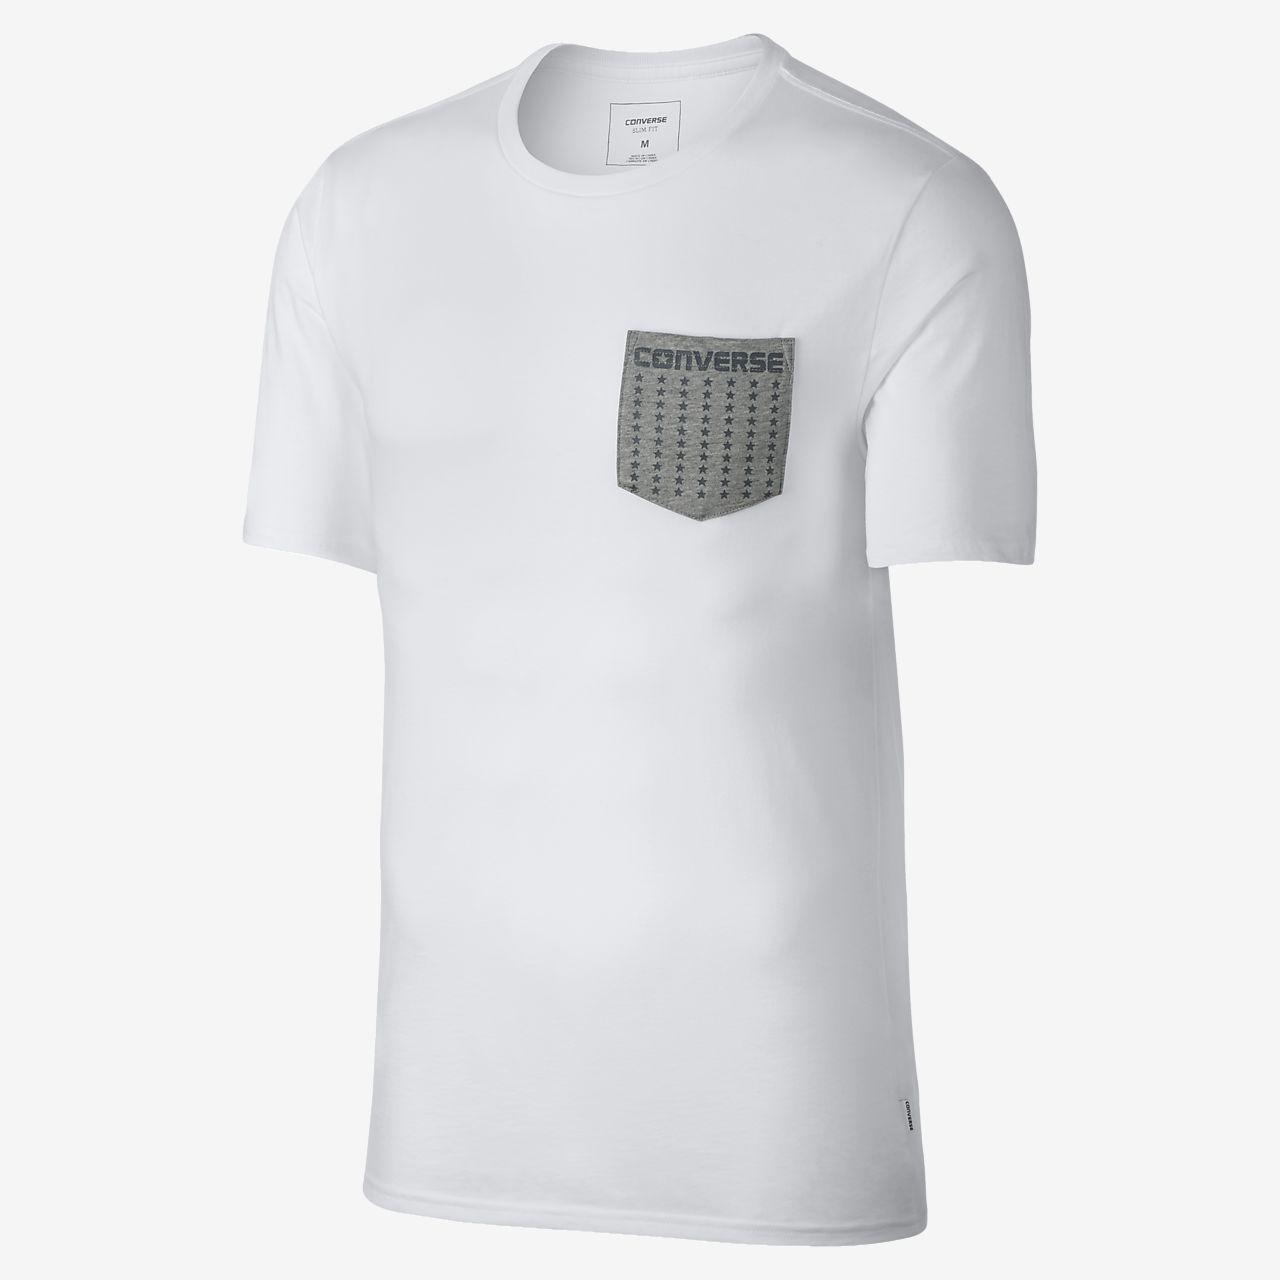 Converse Star Print Pocket Men's T-Shirt . Nike.com